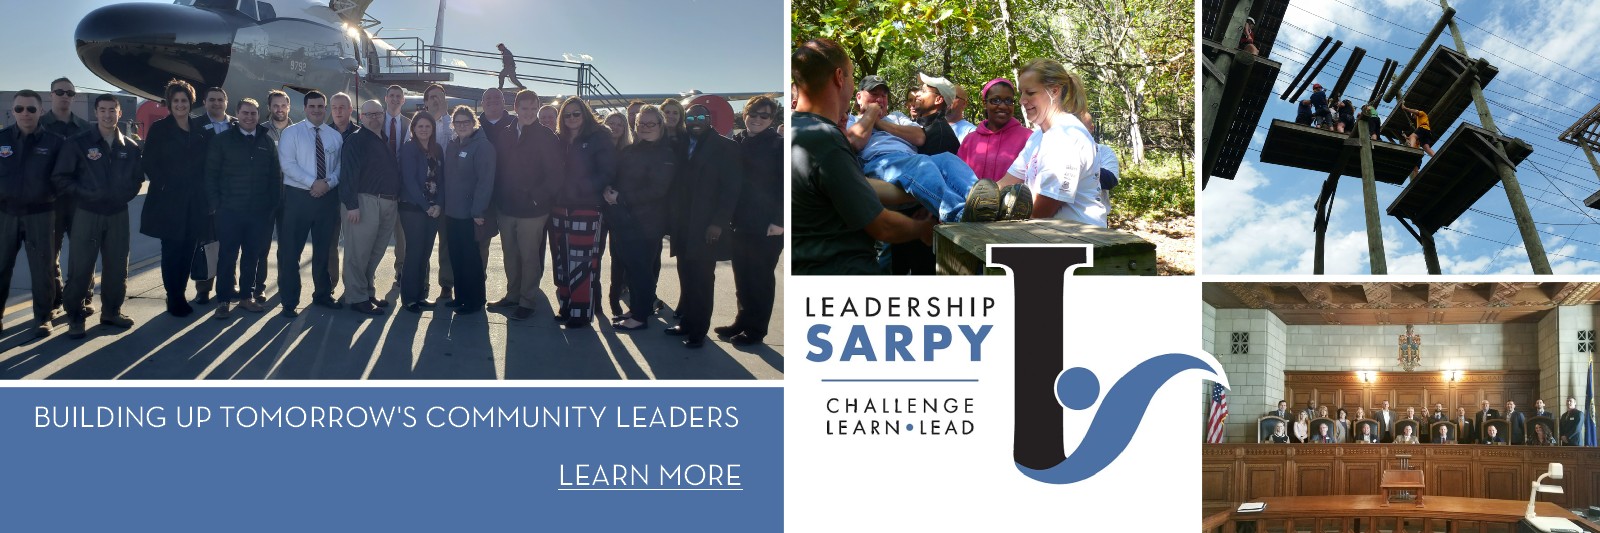 Leadership-Sarpy-Banner.png